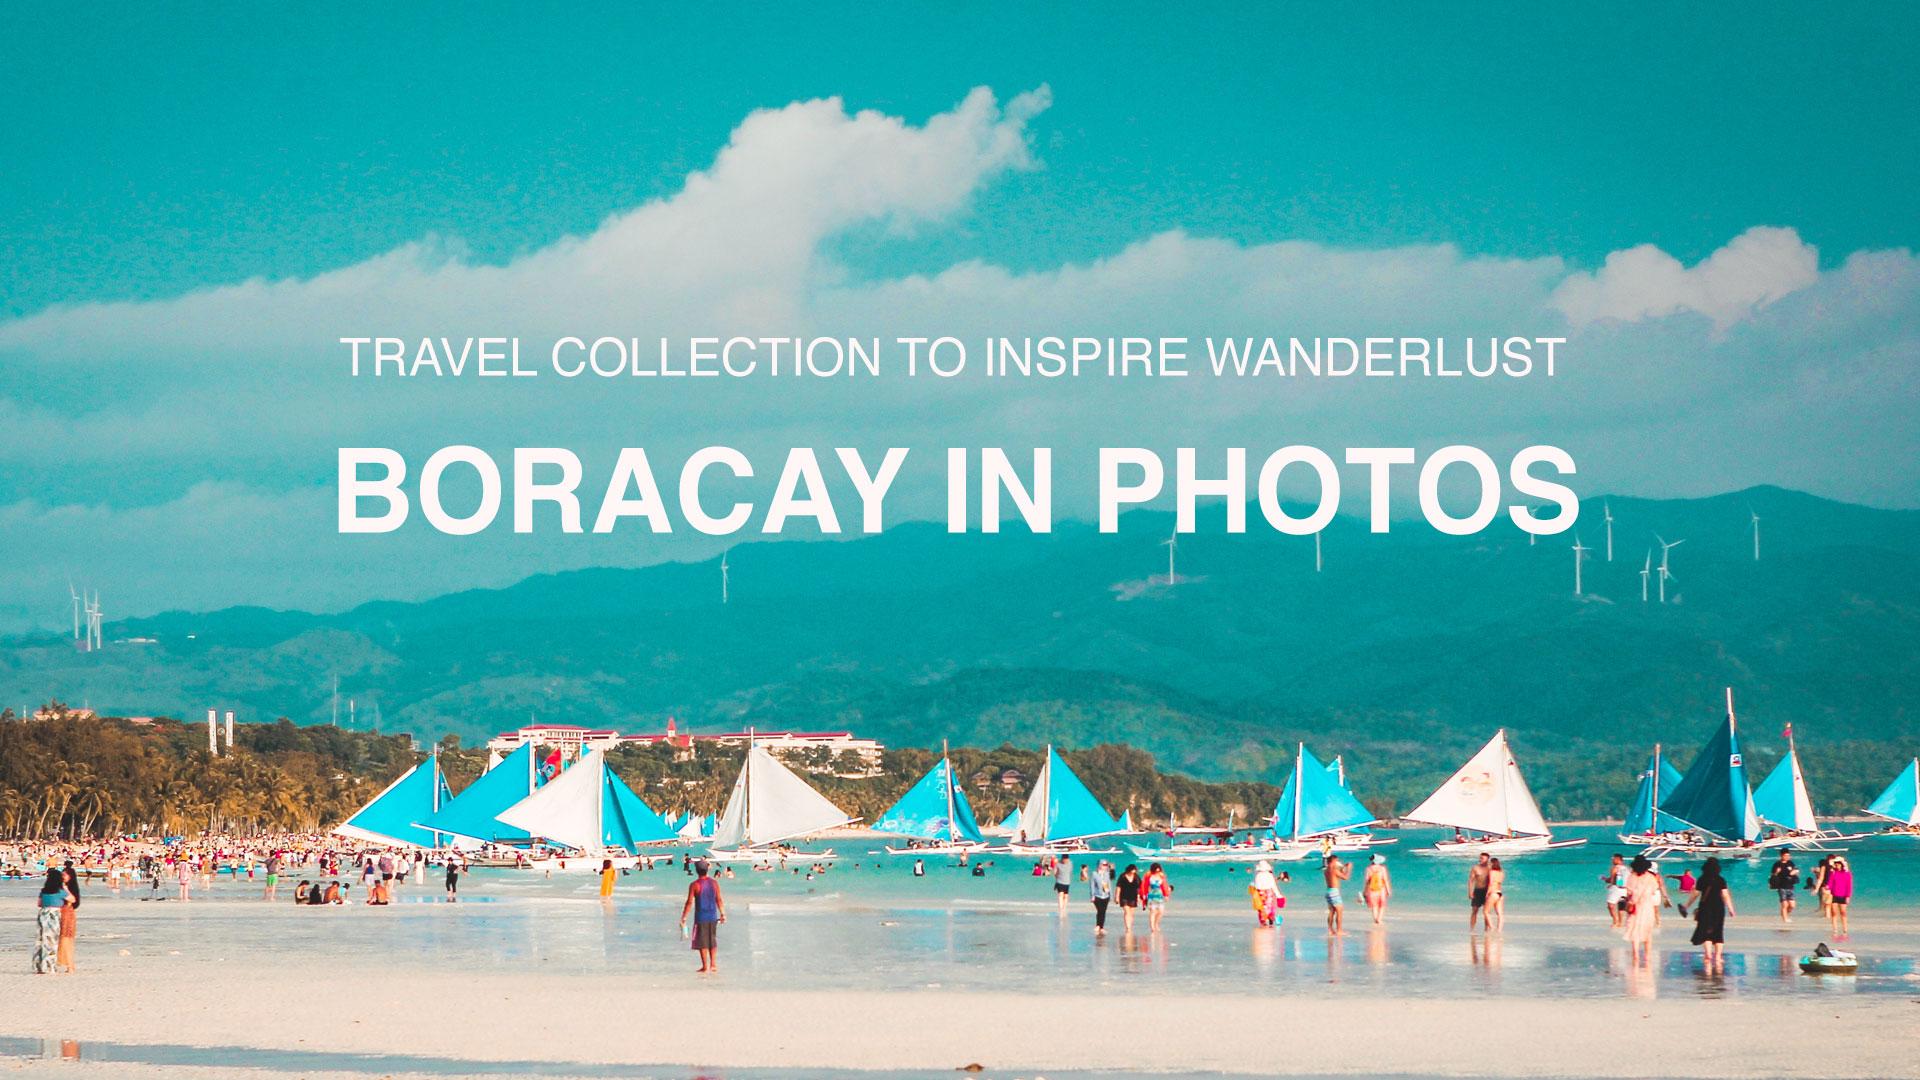 Boracay Photos To Inspire Wanderlust